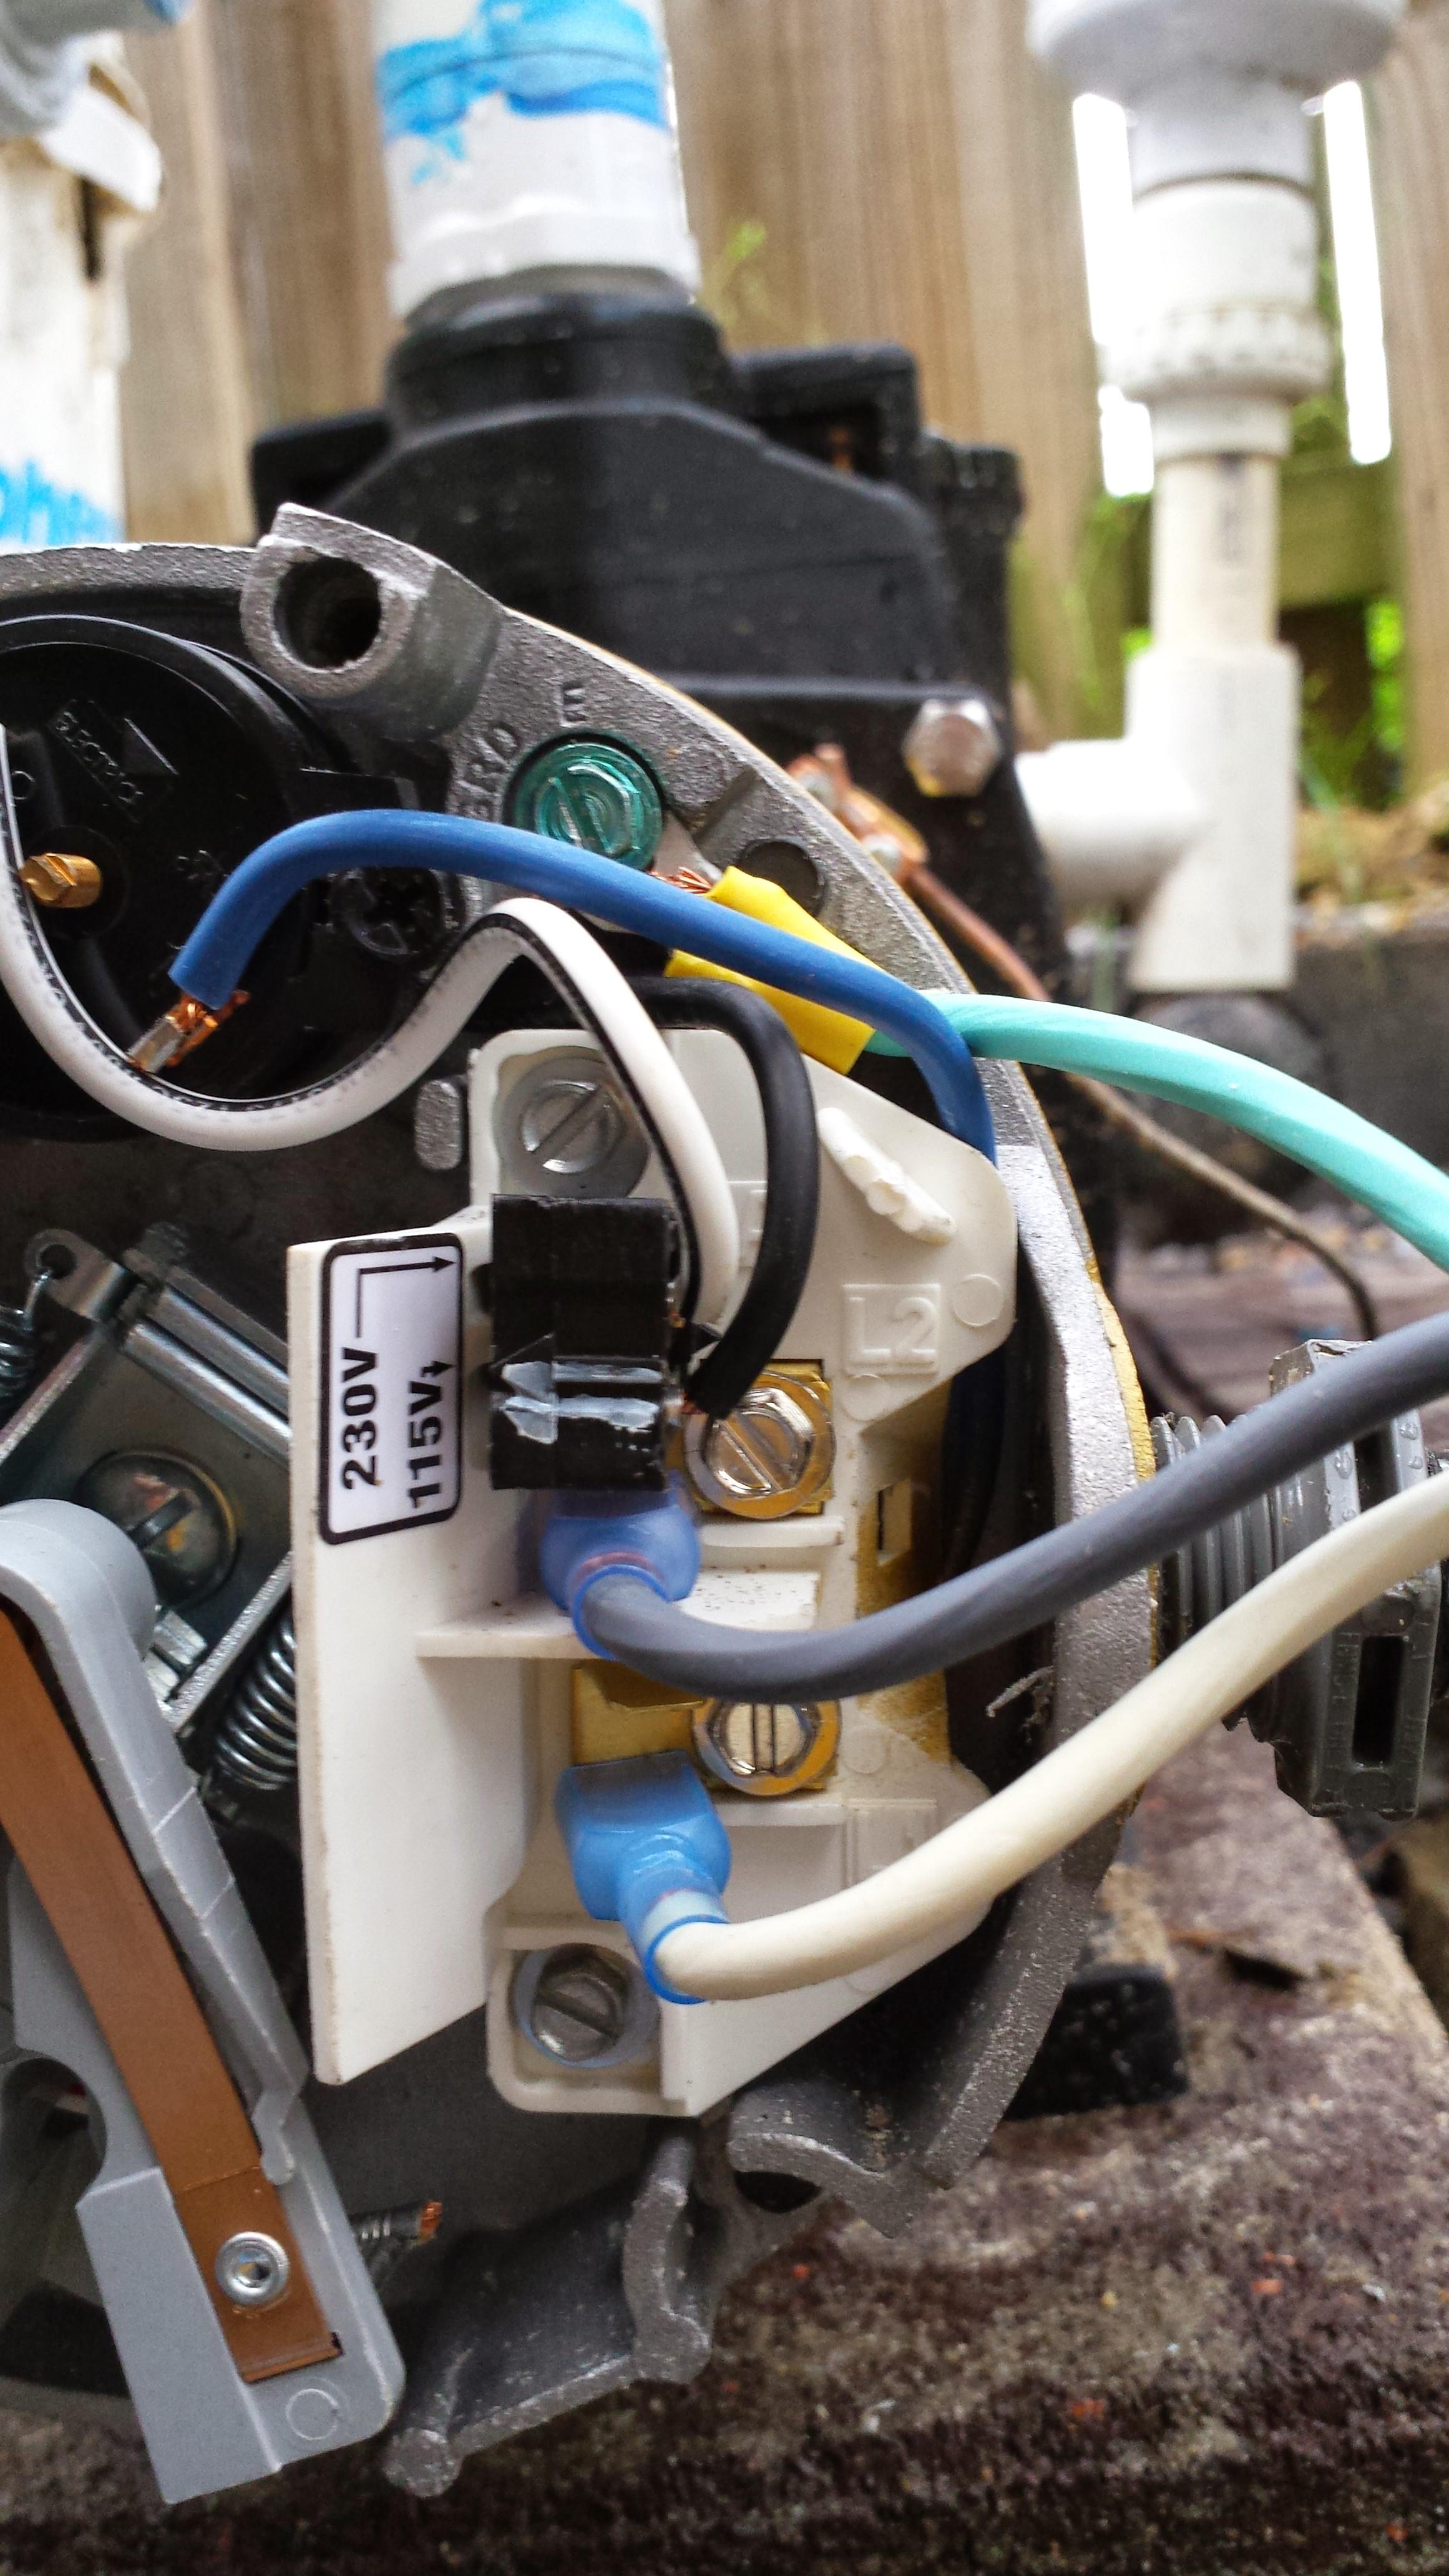 I Have A Hayward 1 1/2 Hp Pool Pump Model C48L2N134B1 It Is Brand - Hayward Super Pump Wiring Diagram 115V